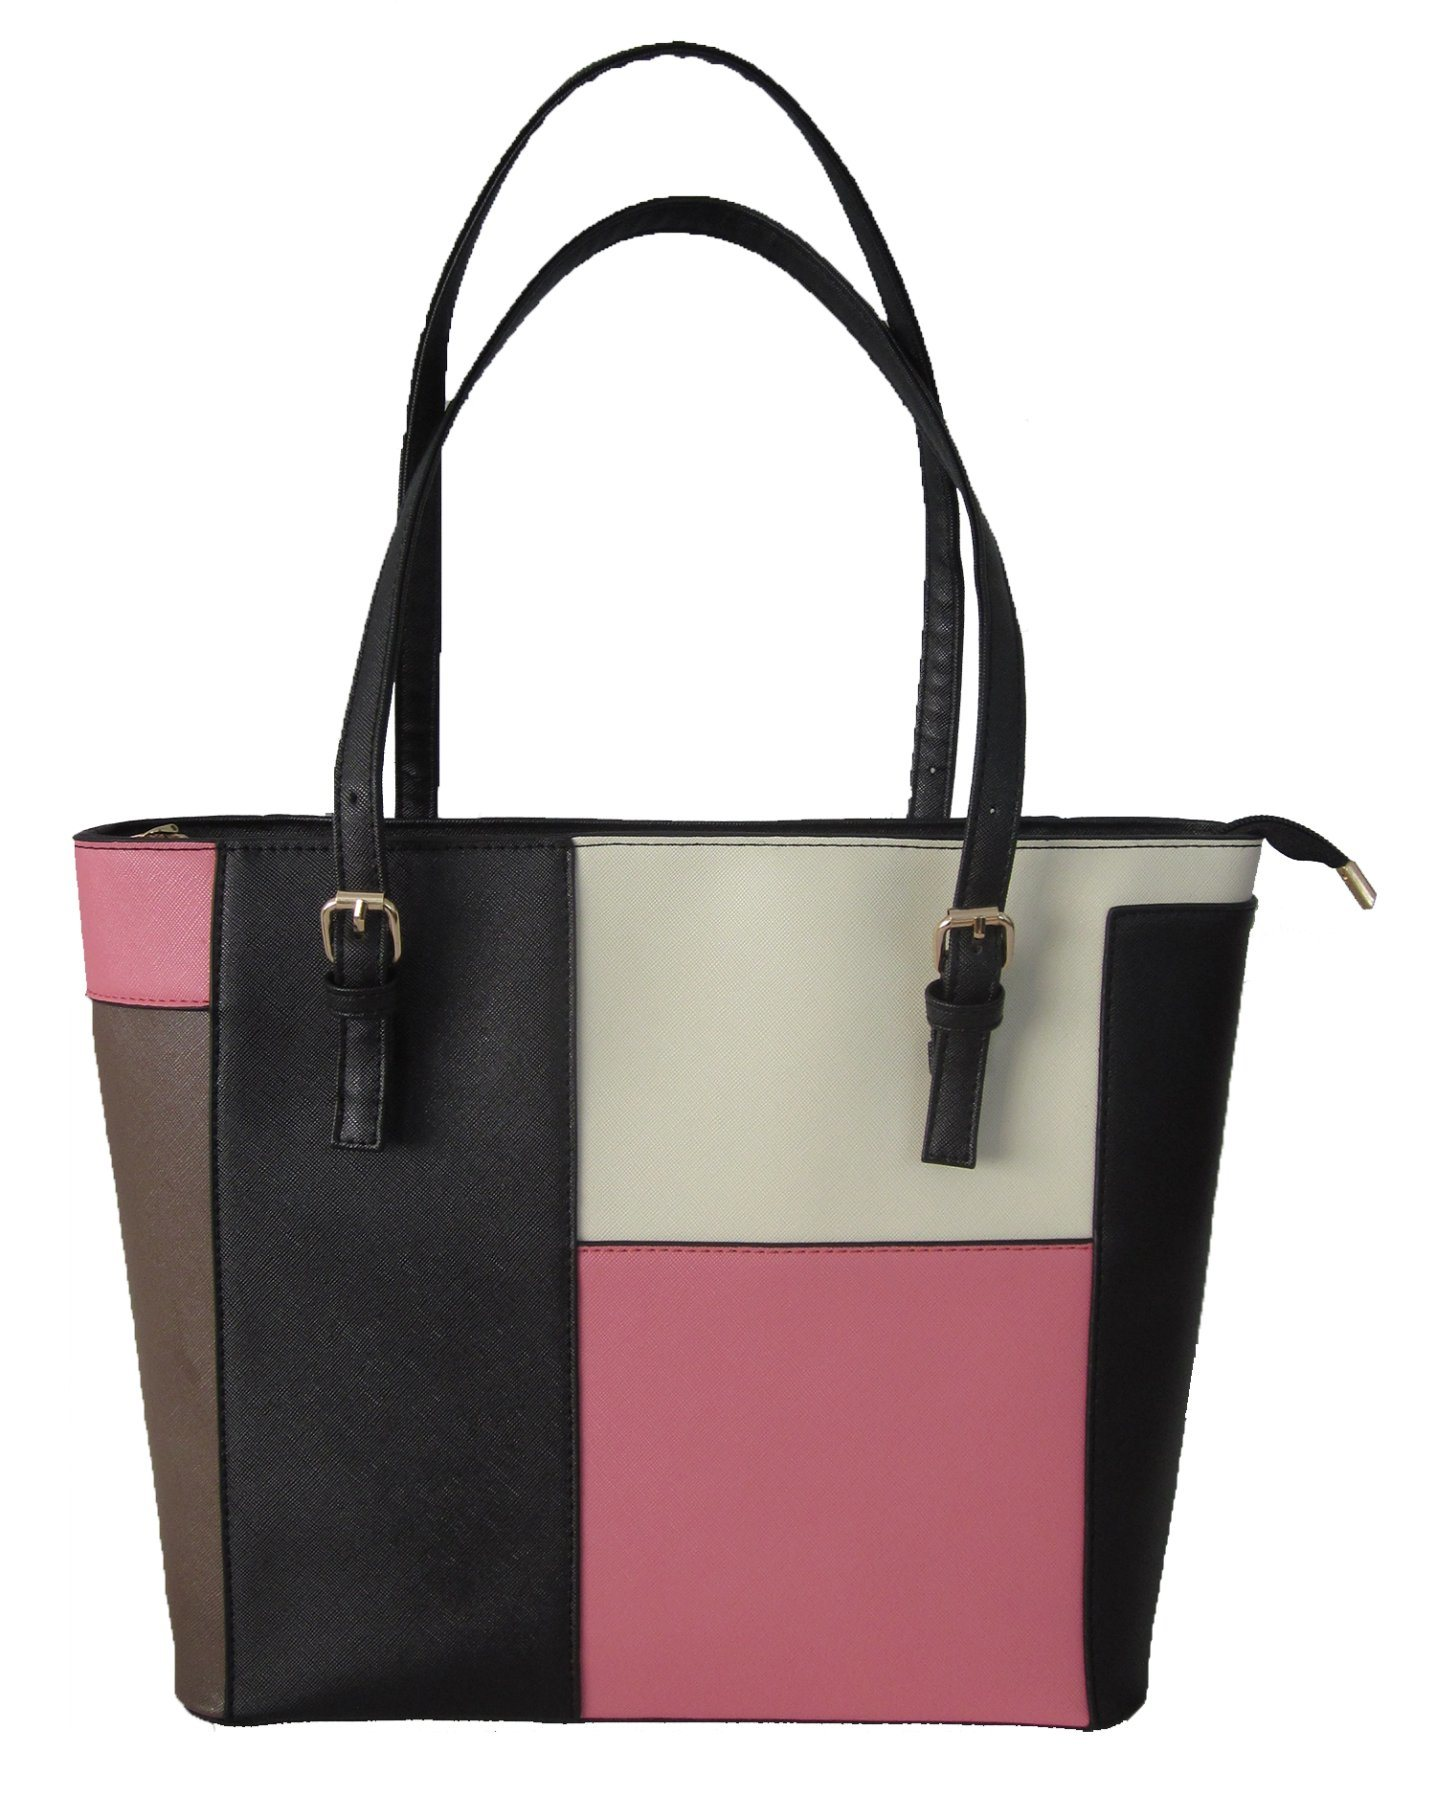 to wear - Handbags stylish for school video